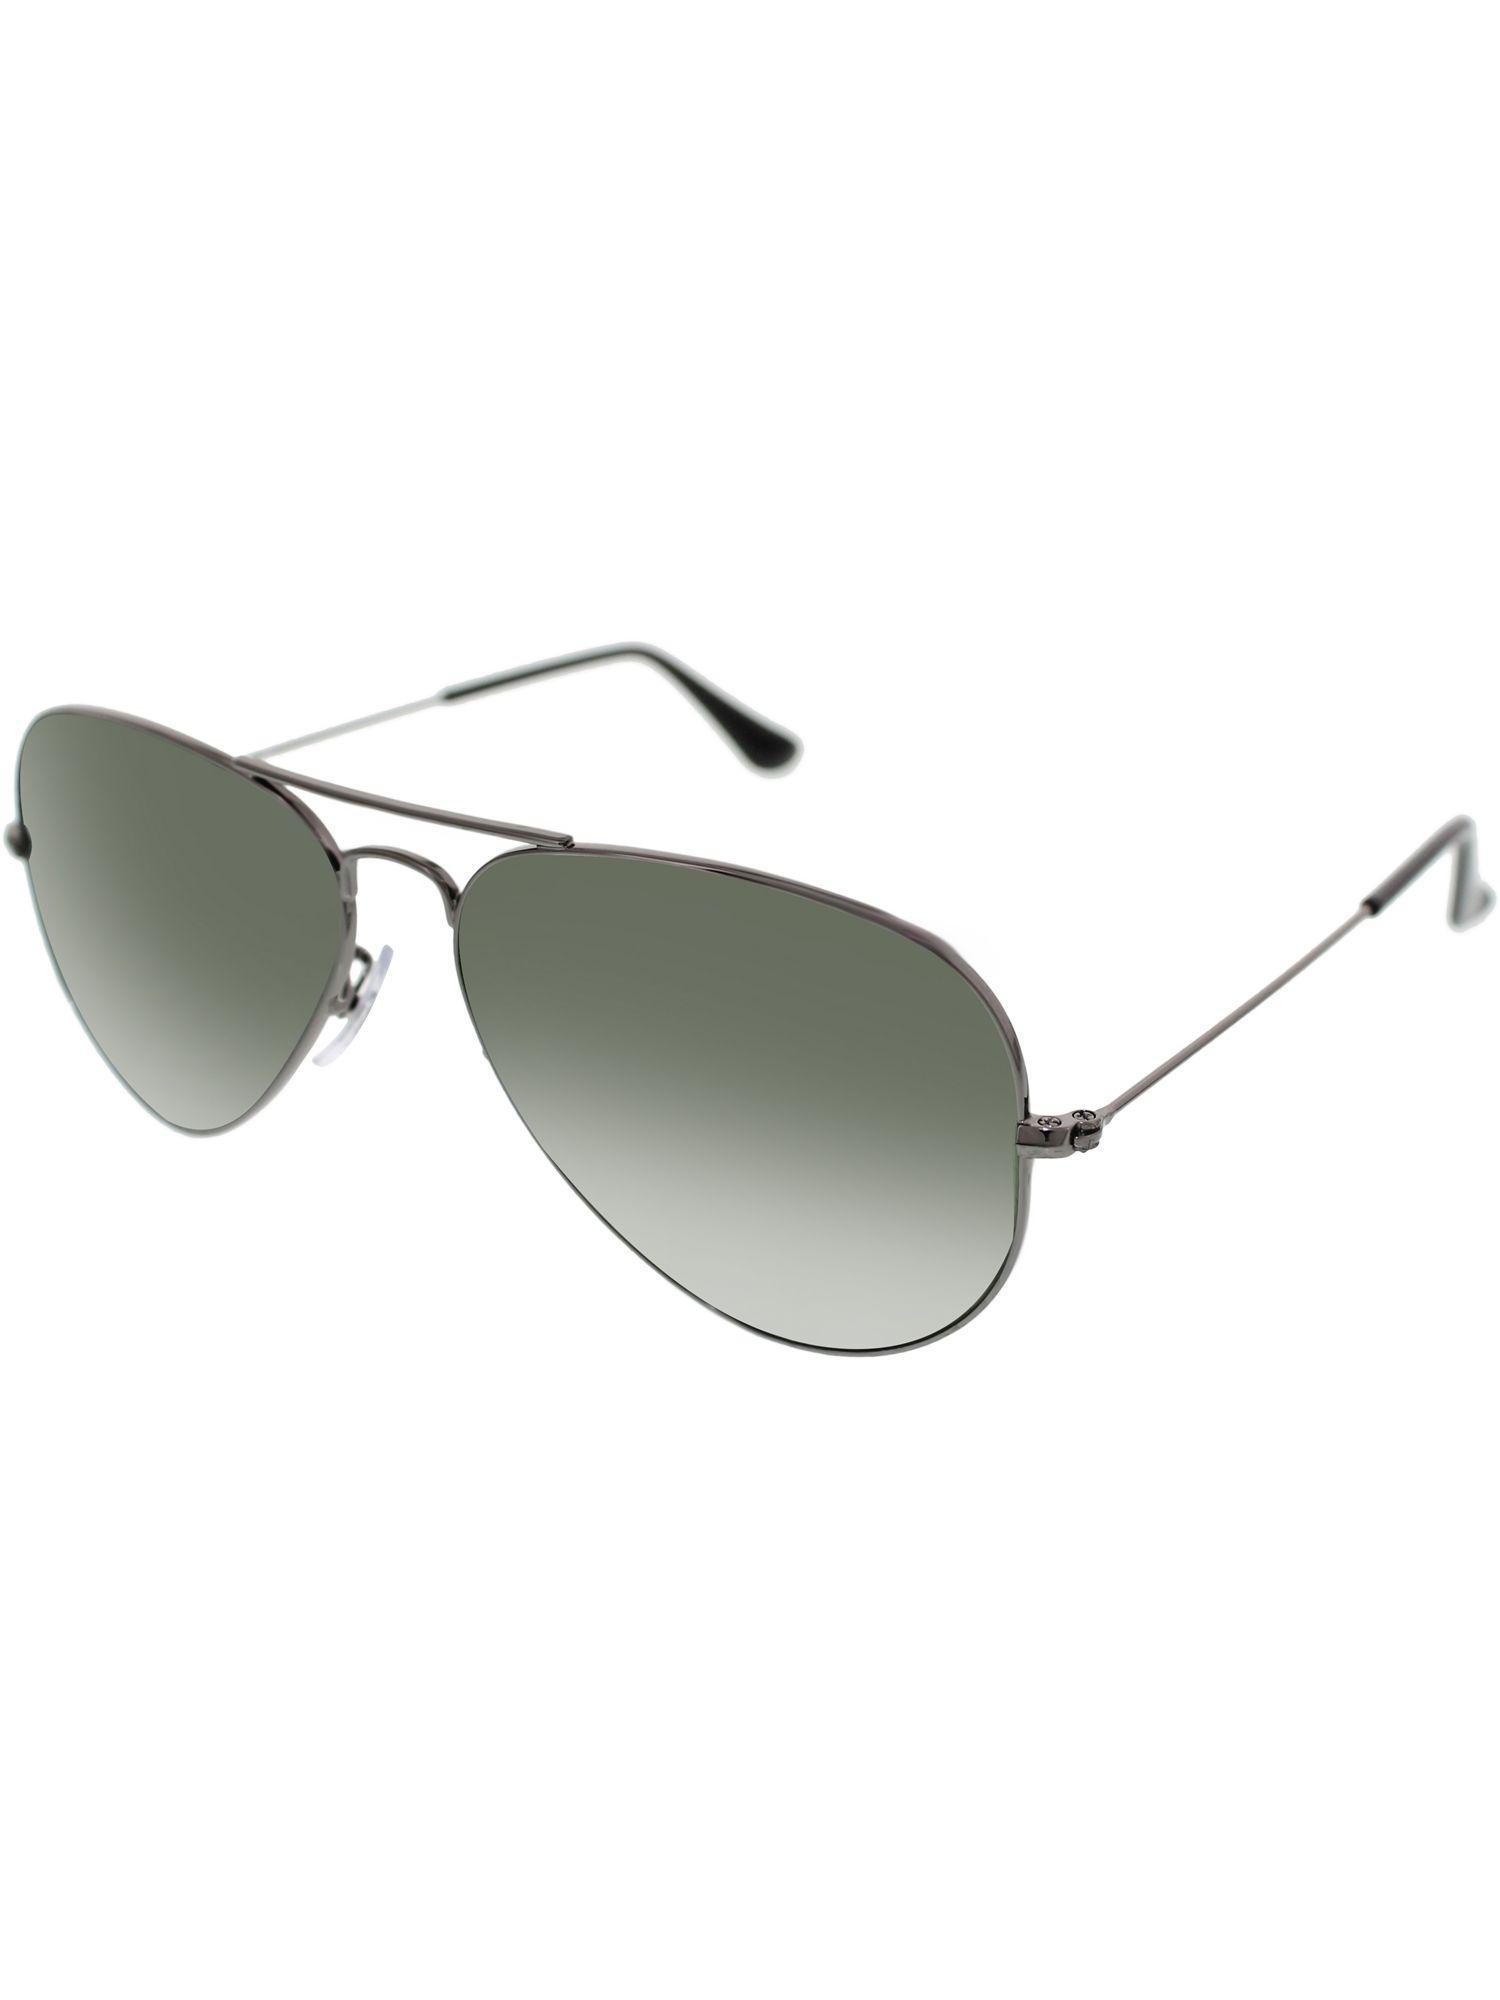 a8a8e113de9b Lyst - Ray-Ban Men s Aviator Rb3025-w0879-58 Gunmetal Sunglasses in ...